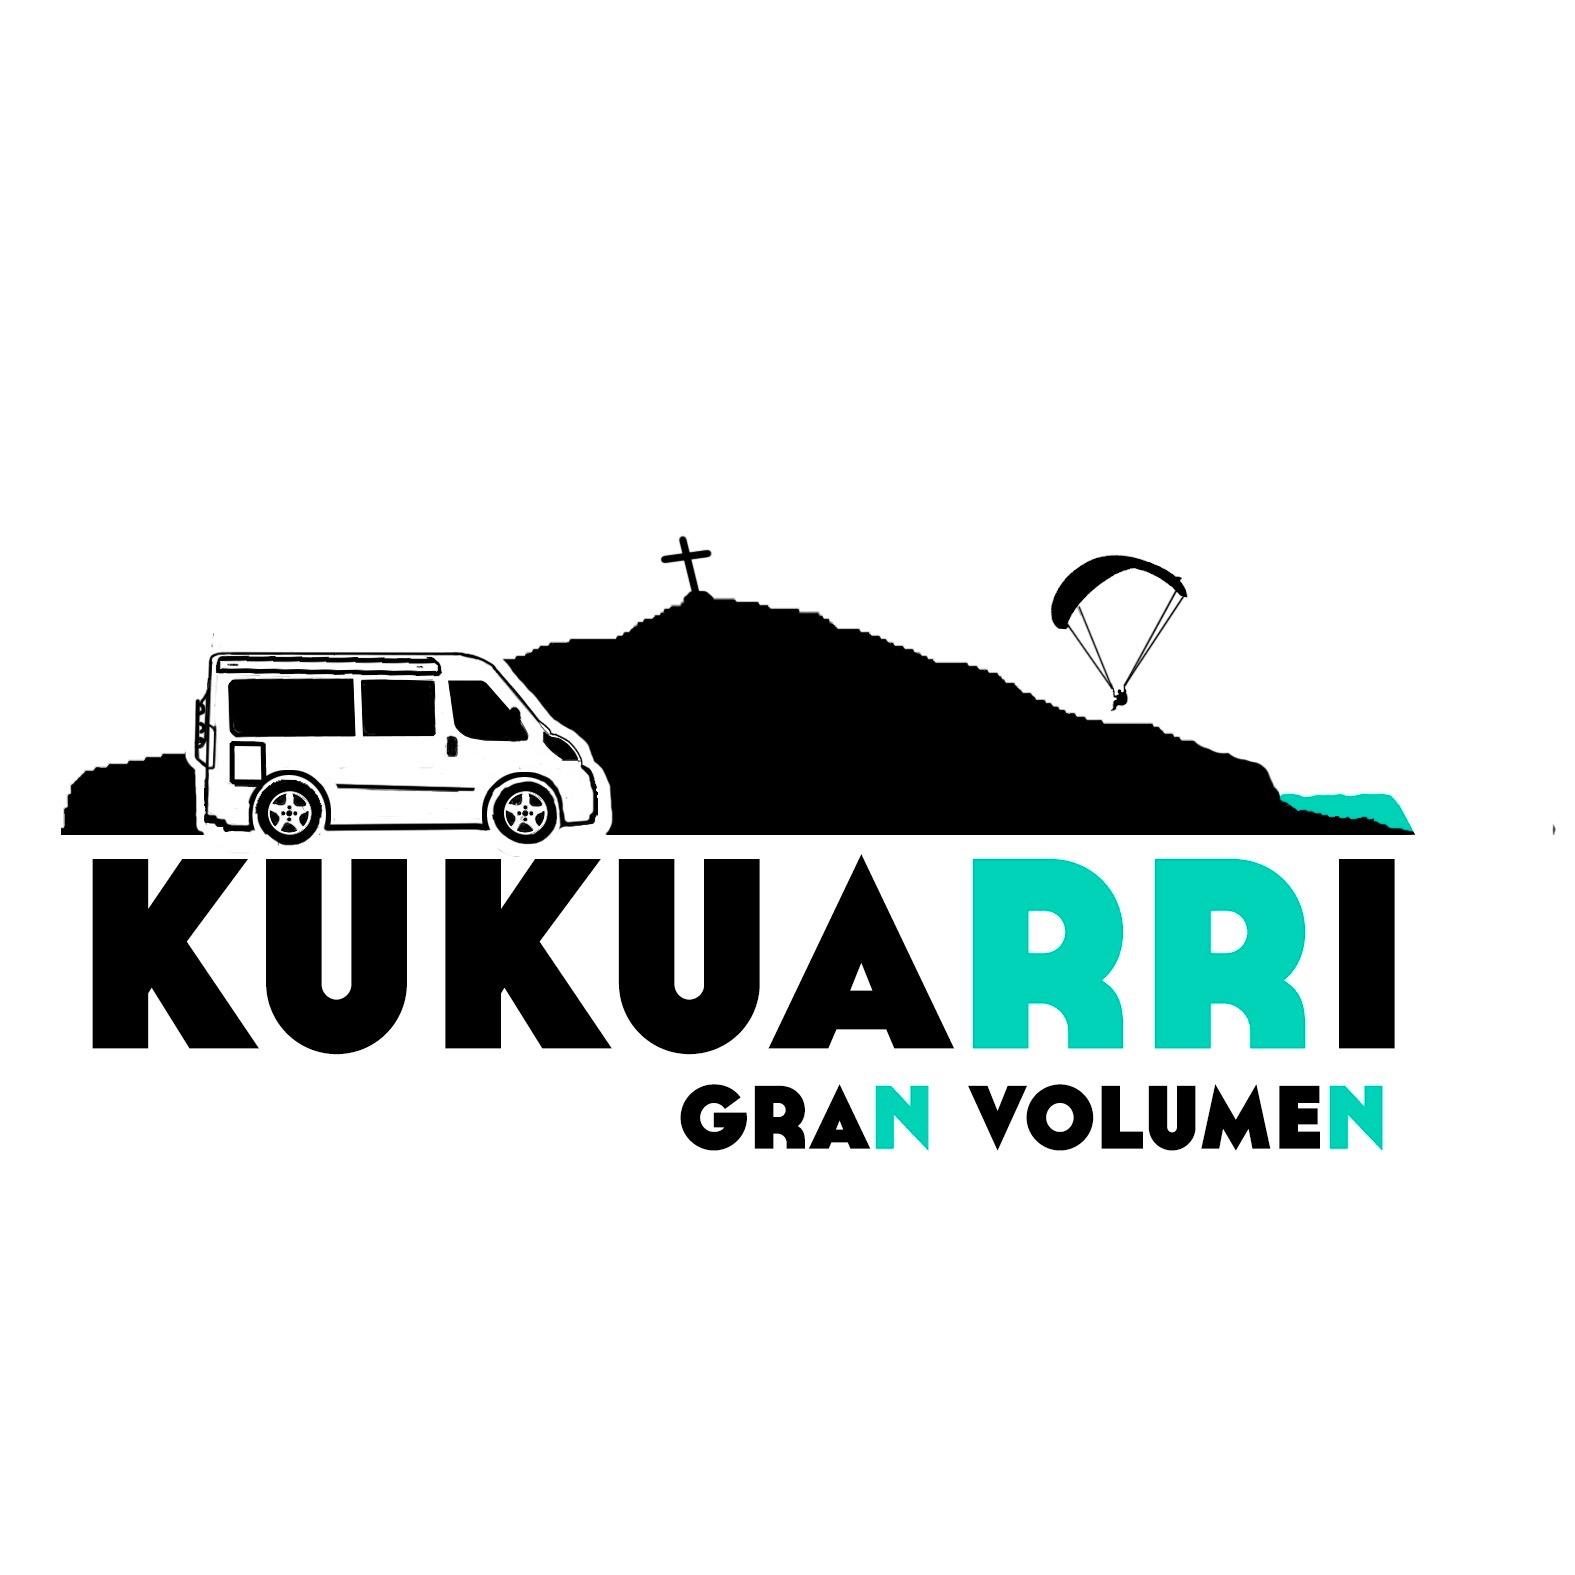 KUKUARRI GRAN VOLUMEN